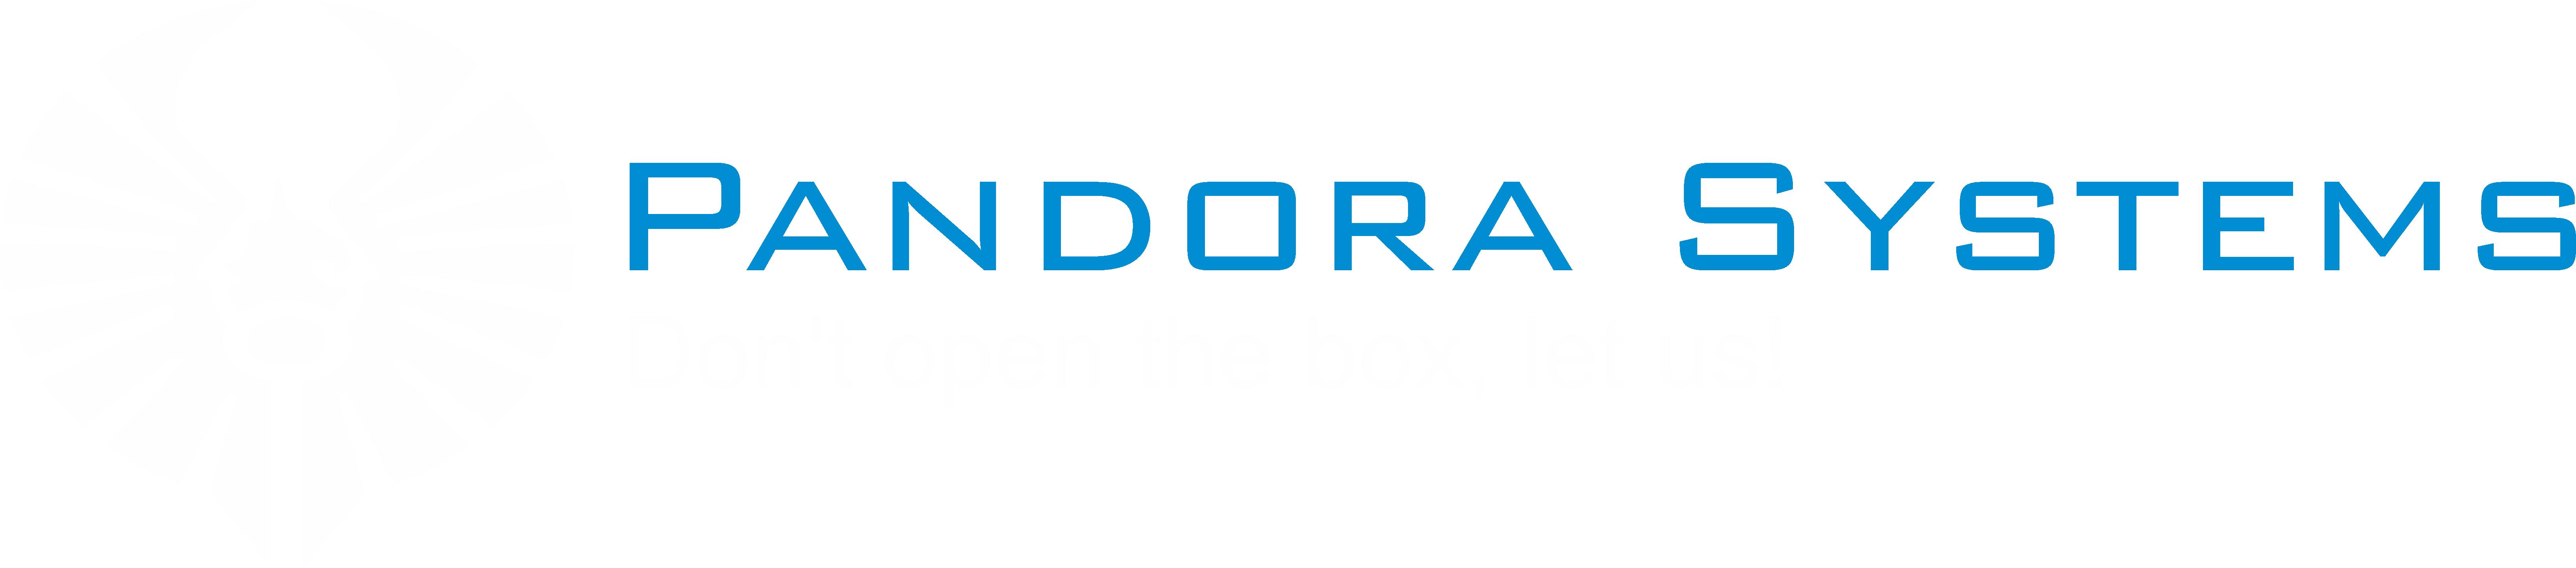 Pandora Systems